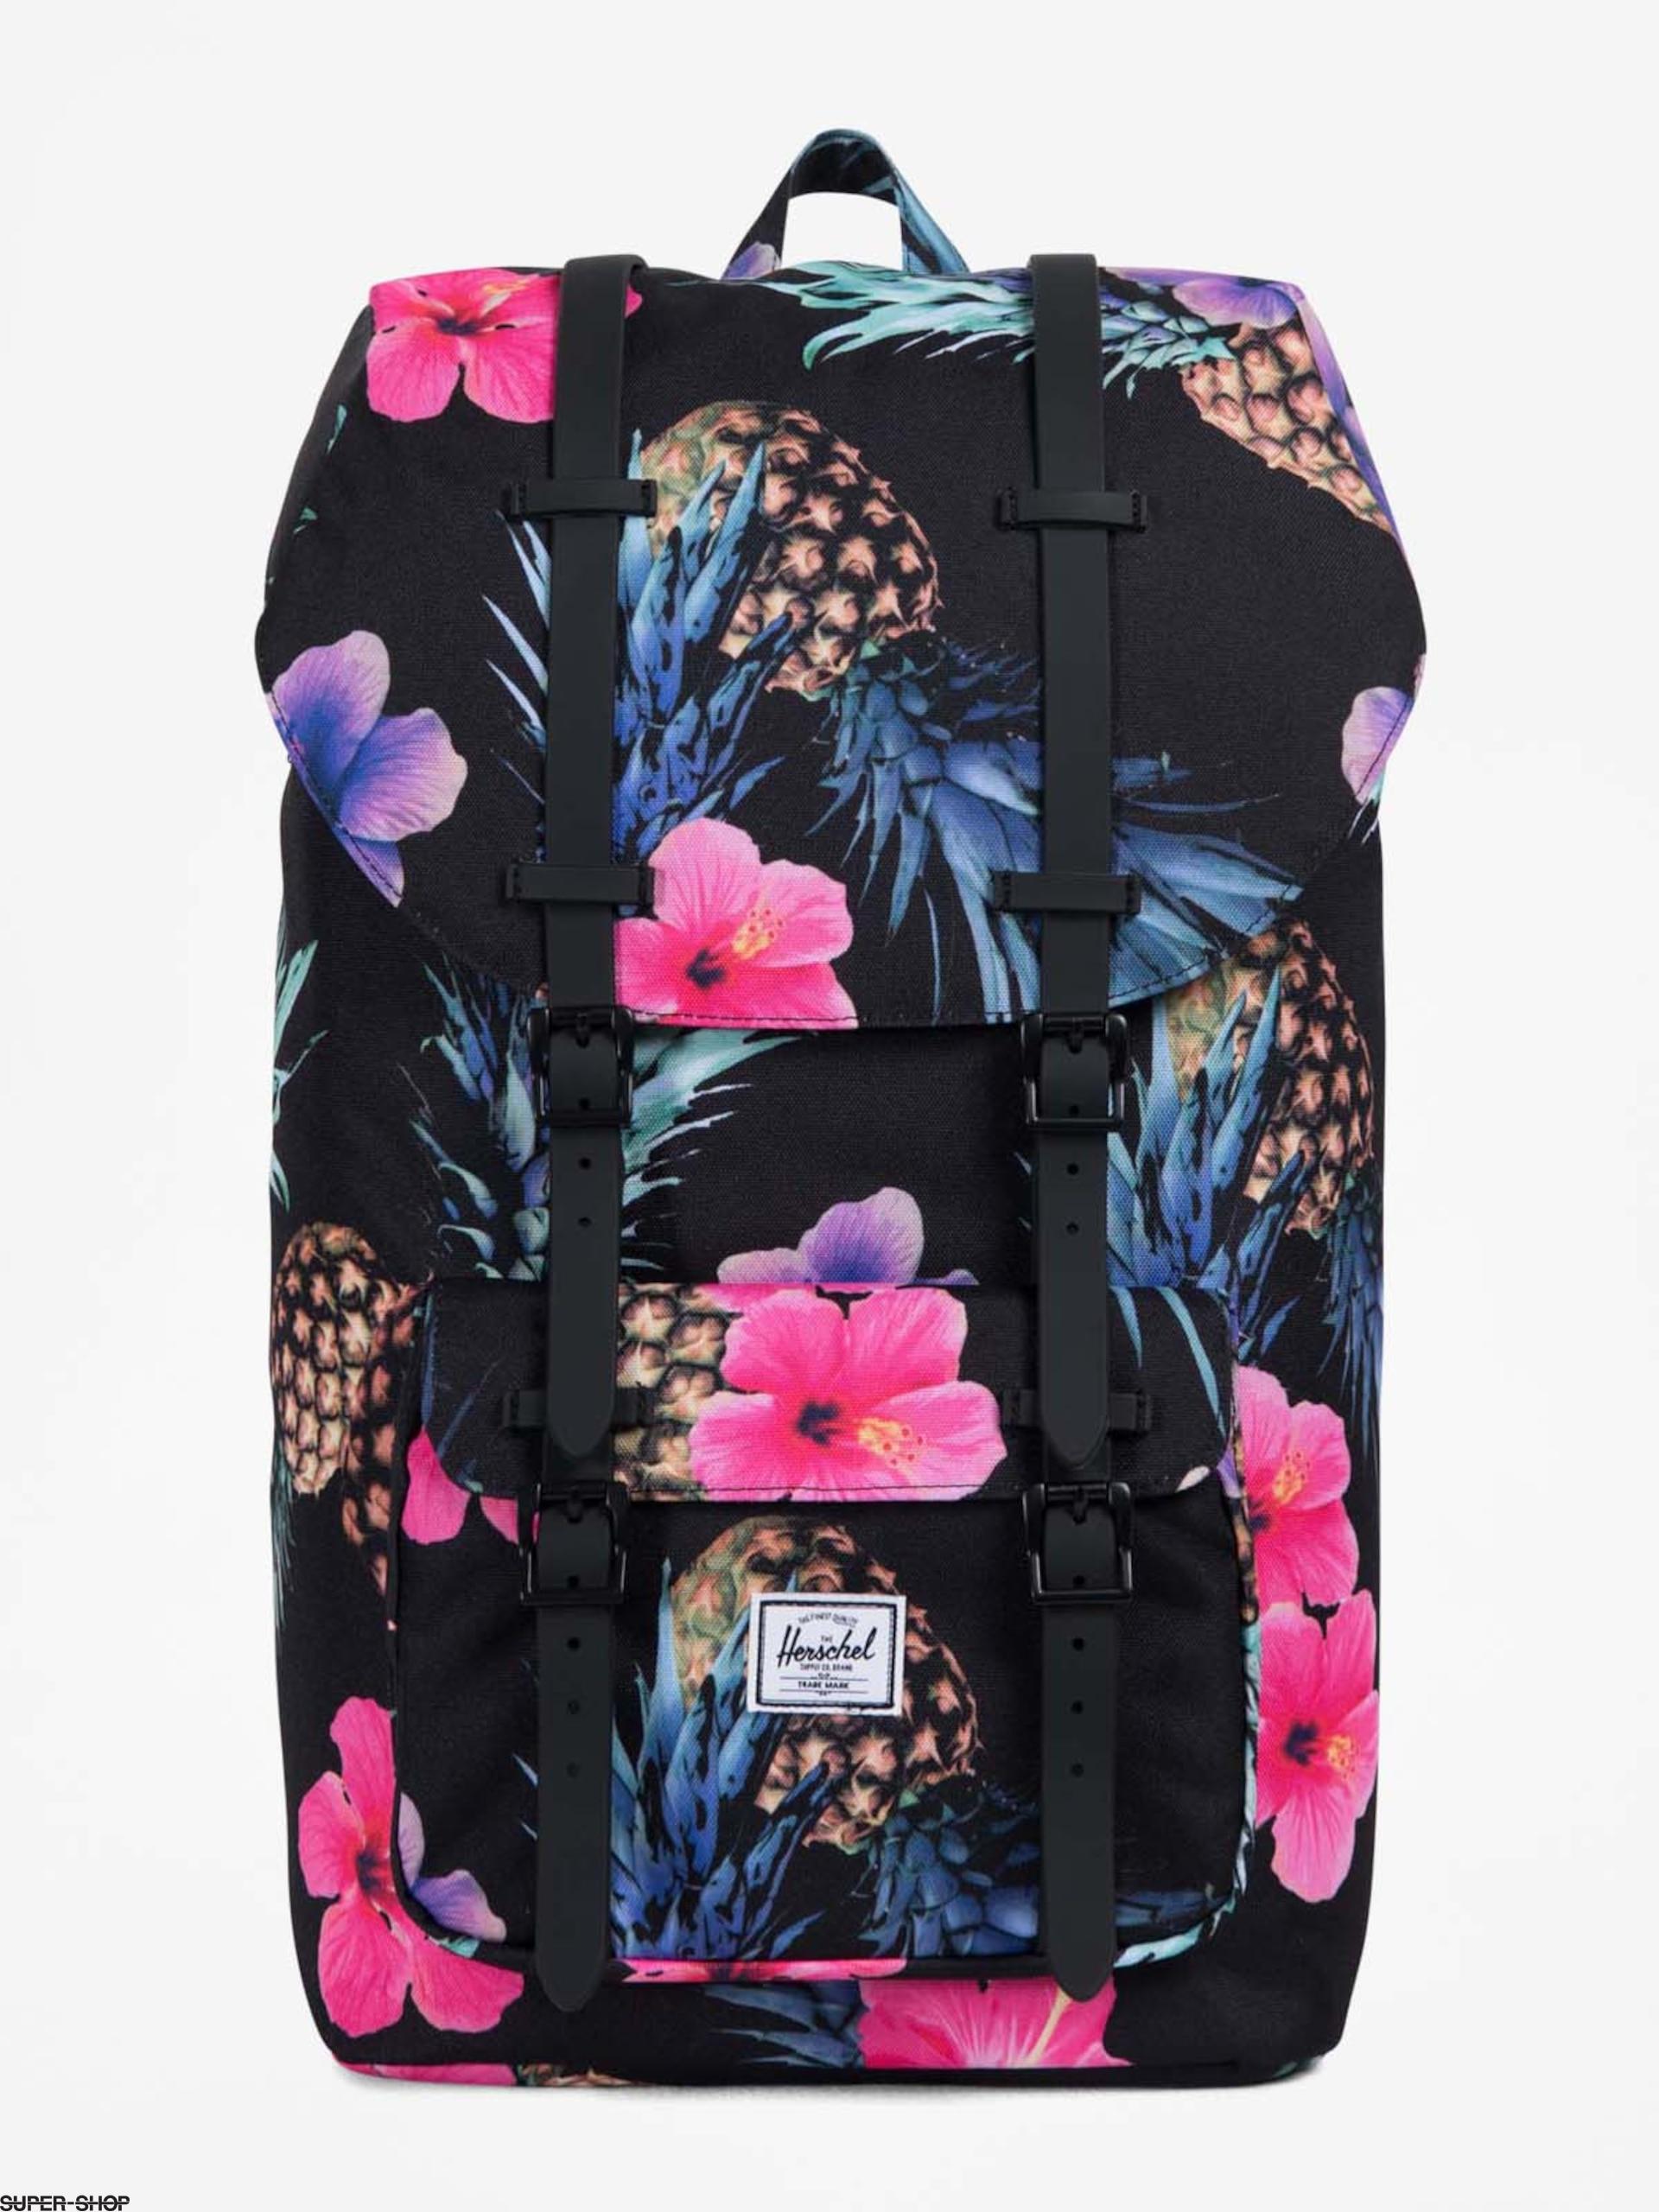 982a6a9fb39 912740-w1920-herschel-supply-co-backpack-little-america -black-pineapple-black-rubber.jpg